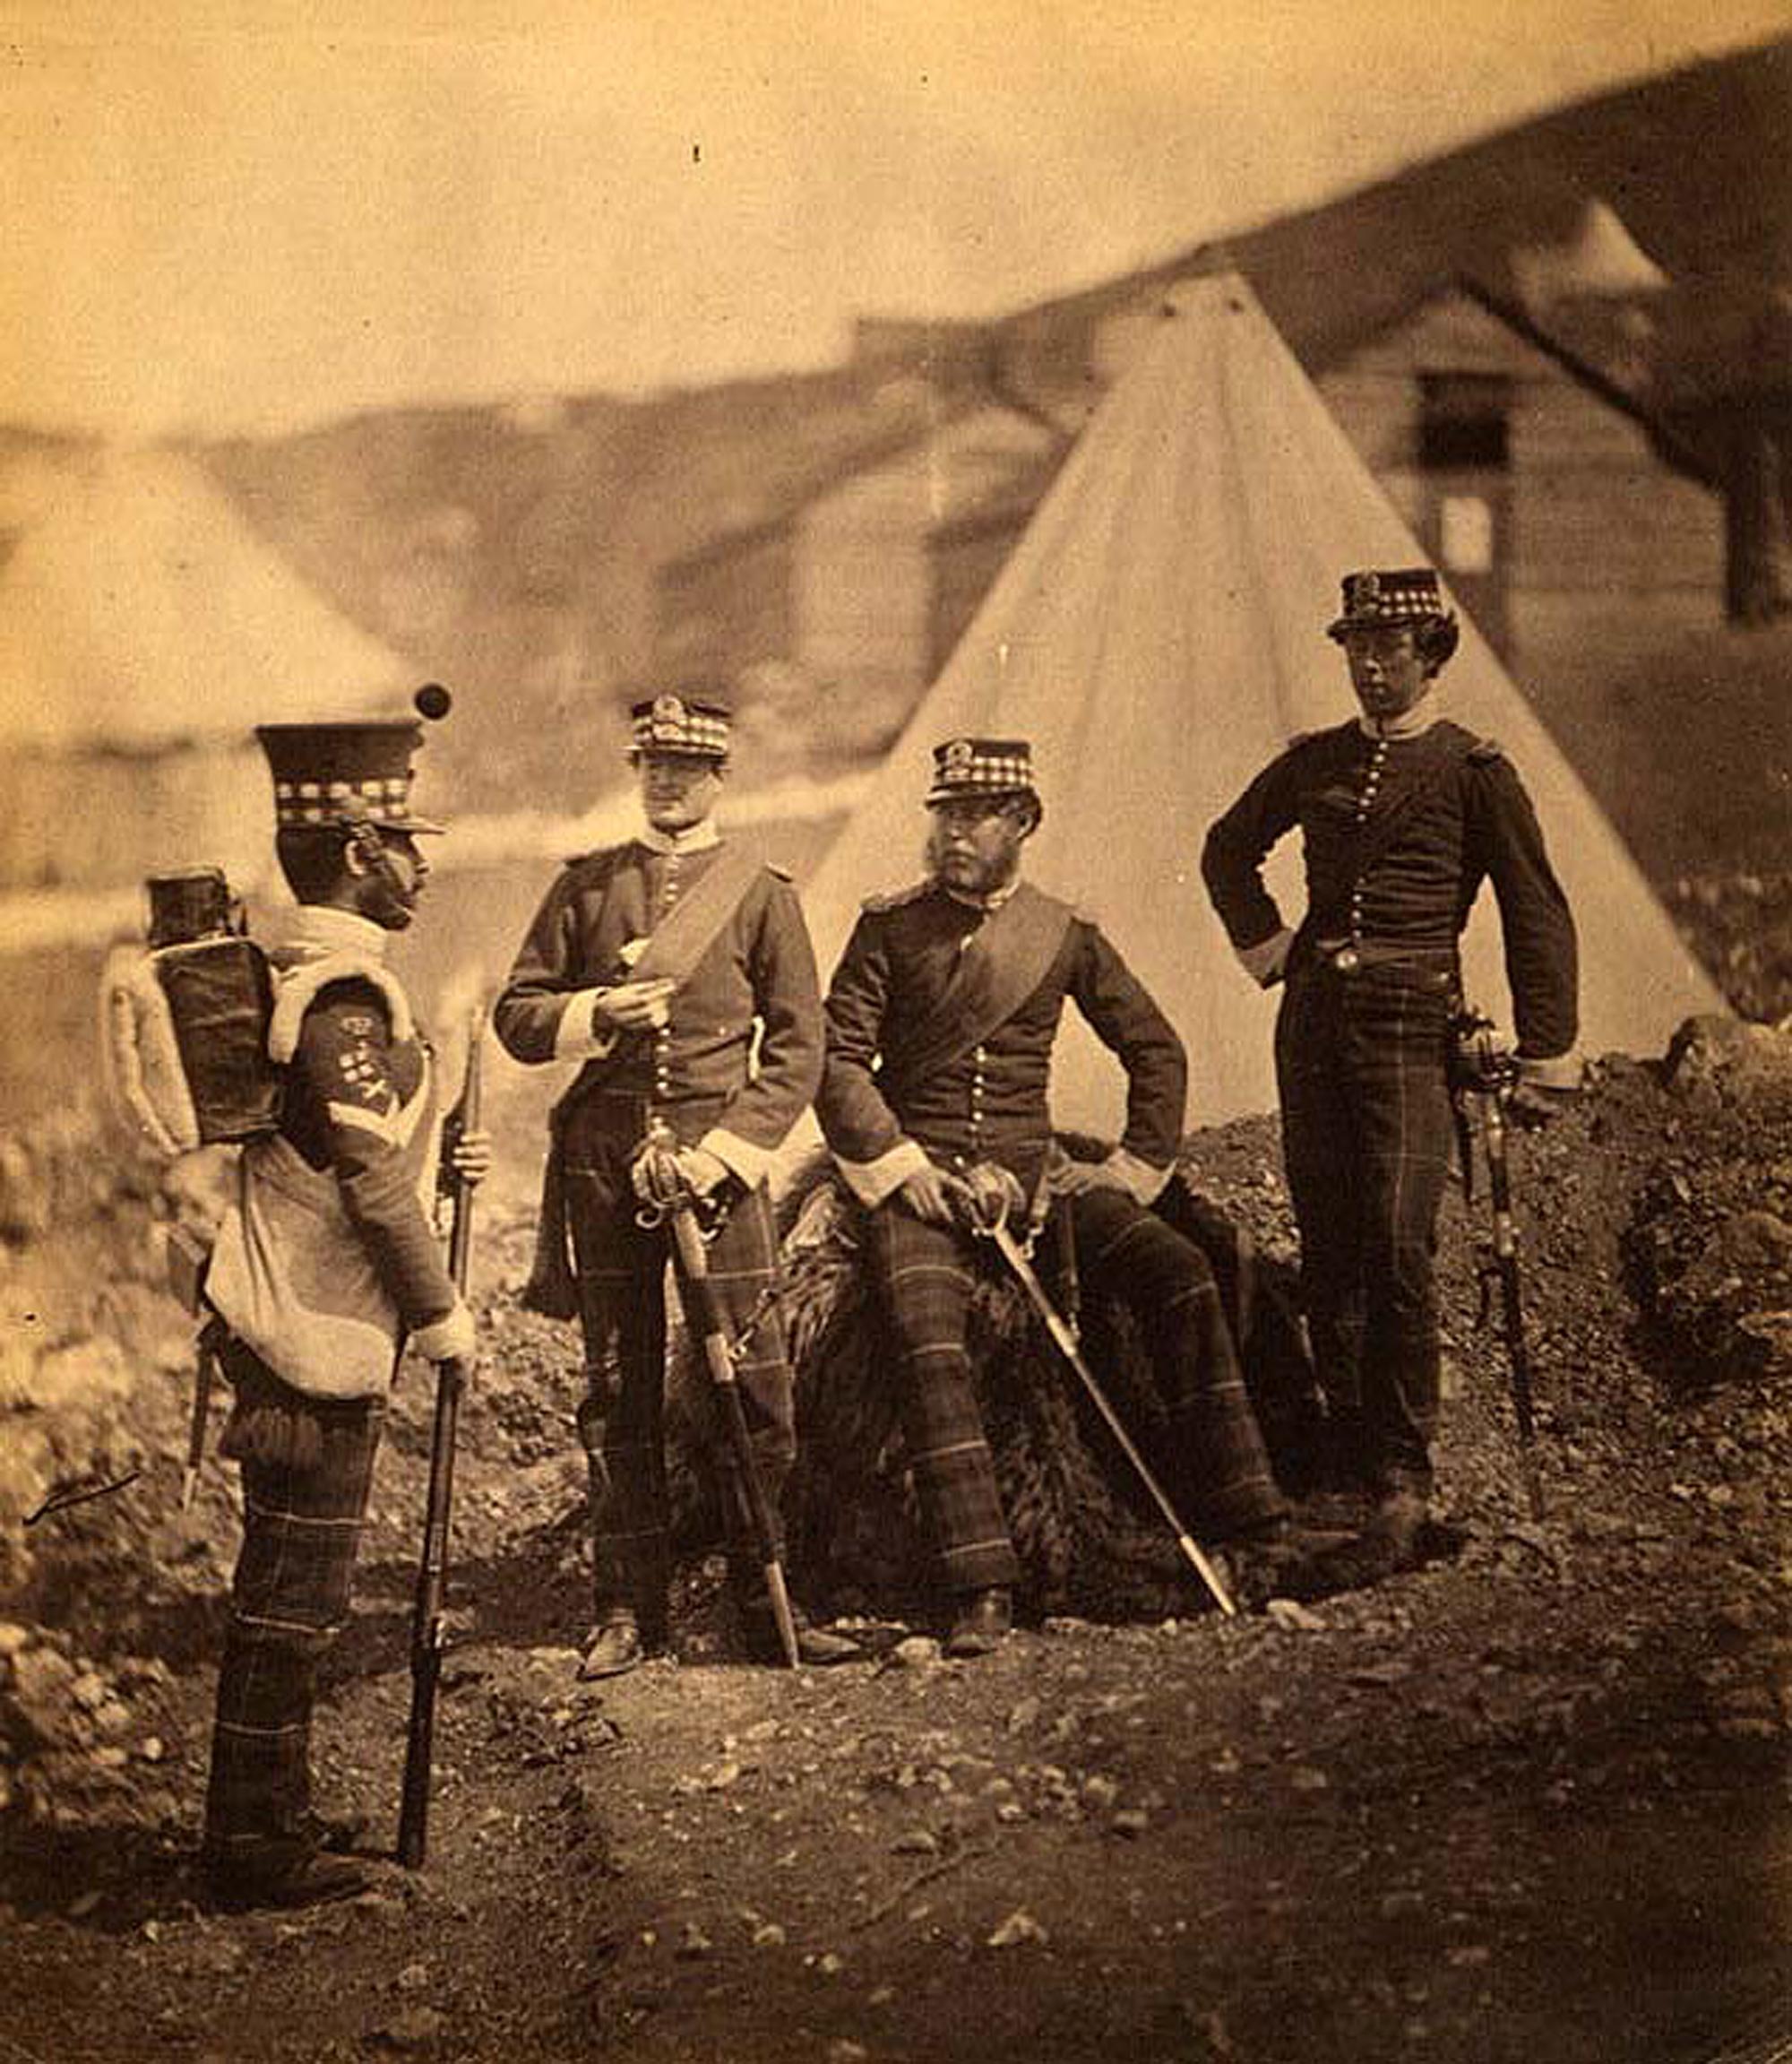 Fot. Roger Fenton, za Biblioteka Kongresu